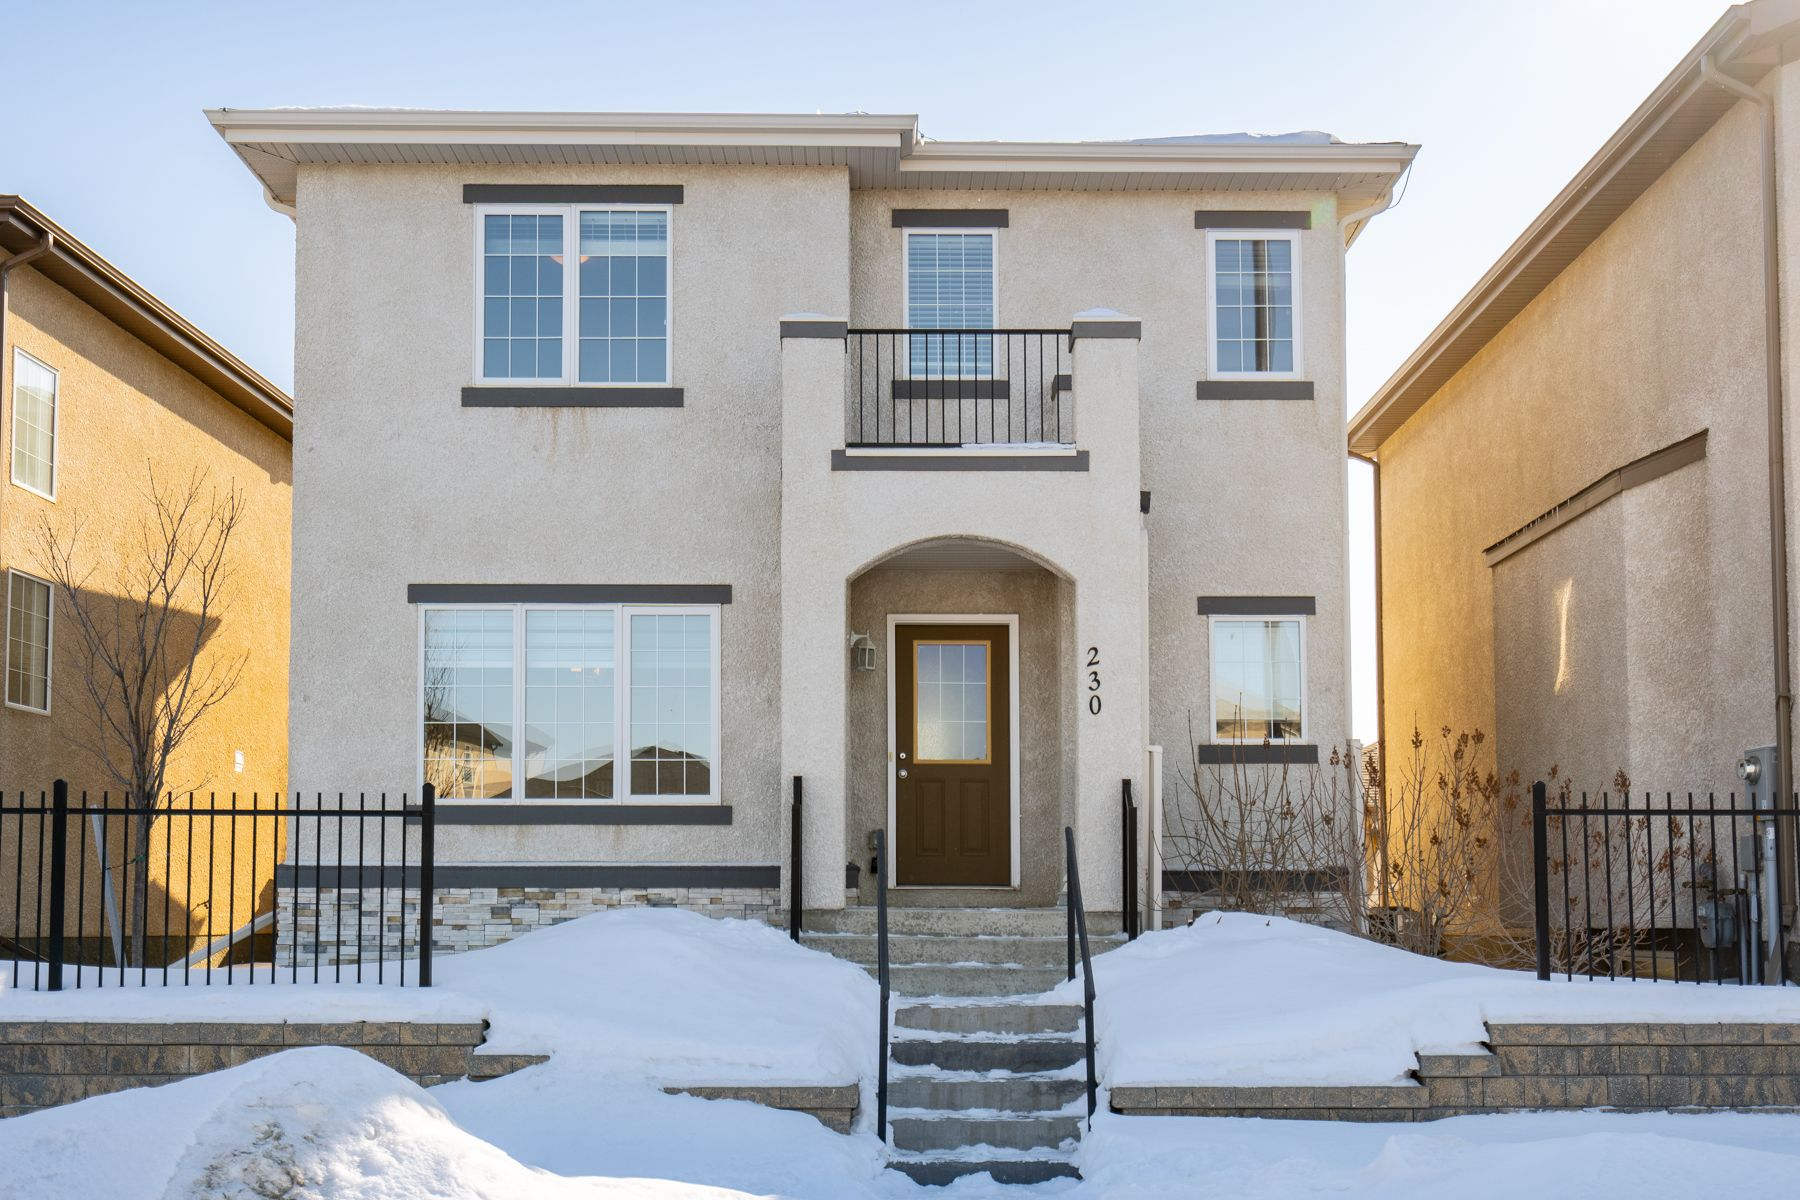 Main Photo: 230 Edward Turner Drive in Winnipeg: Sage Creek House for sale (2K)  : MLS®# 202006143